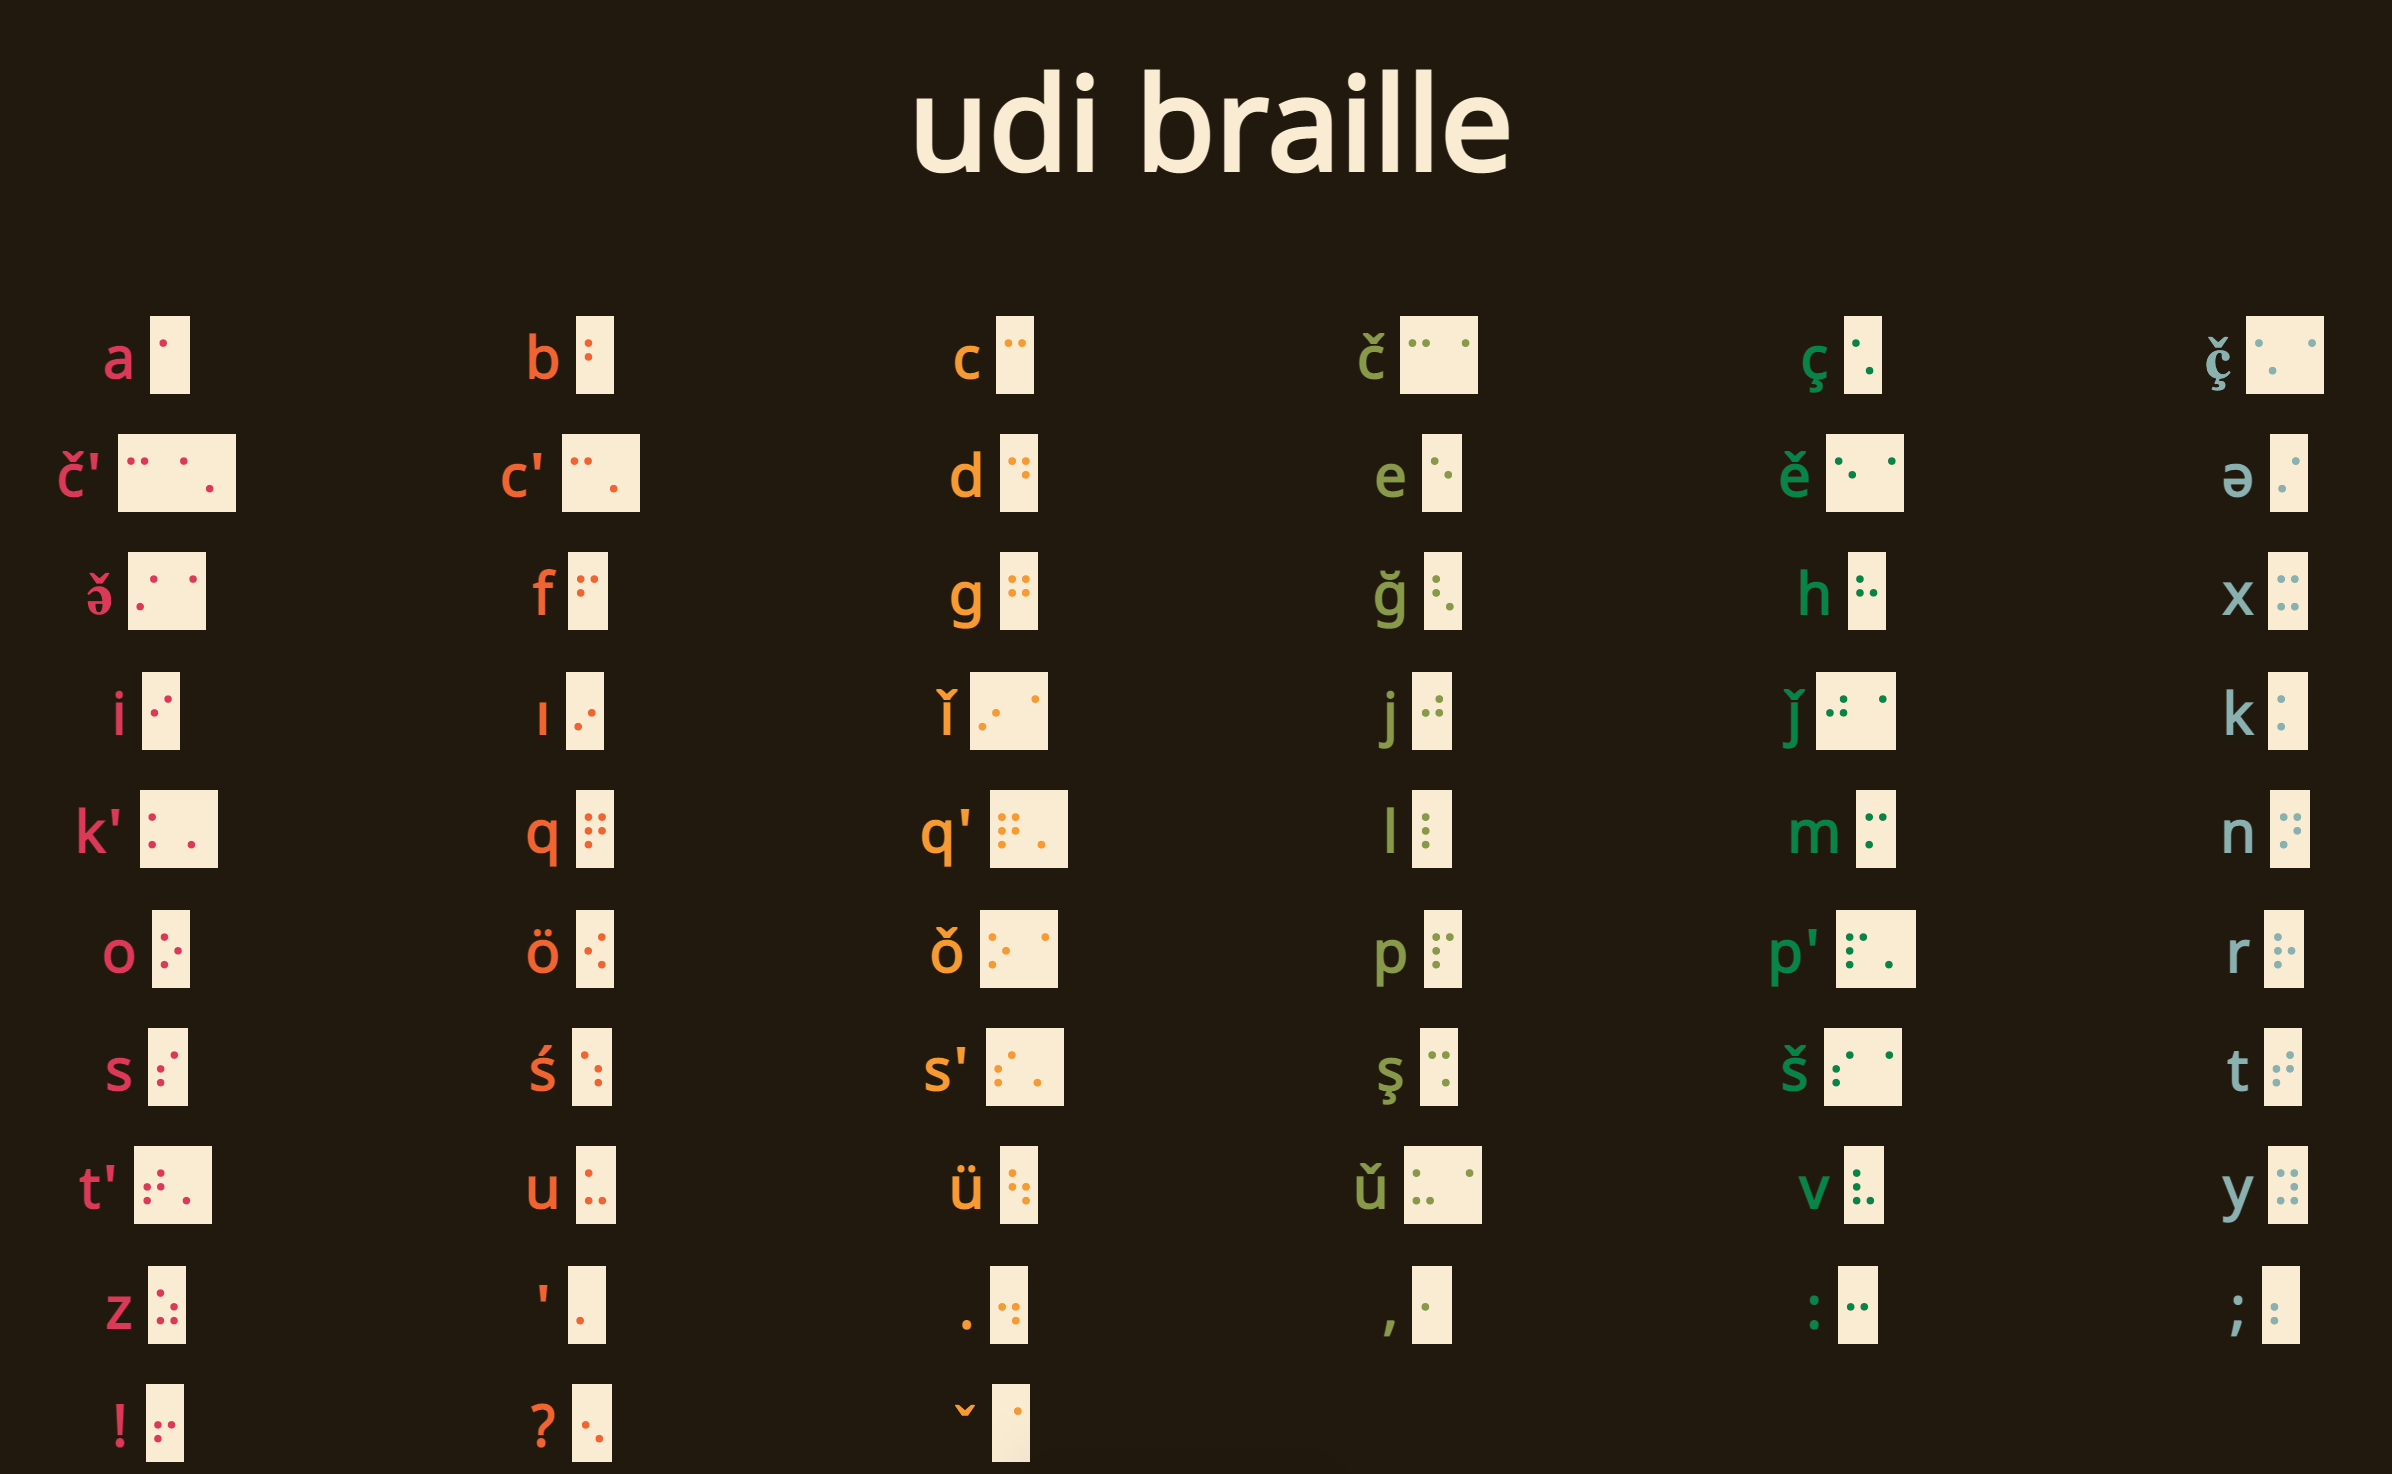 Студент из США Harris Mowbray перевел на шрифт Брайля удинский алфавит.